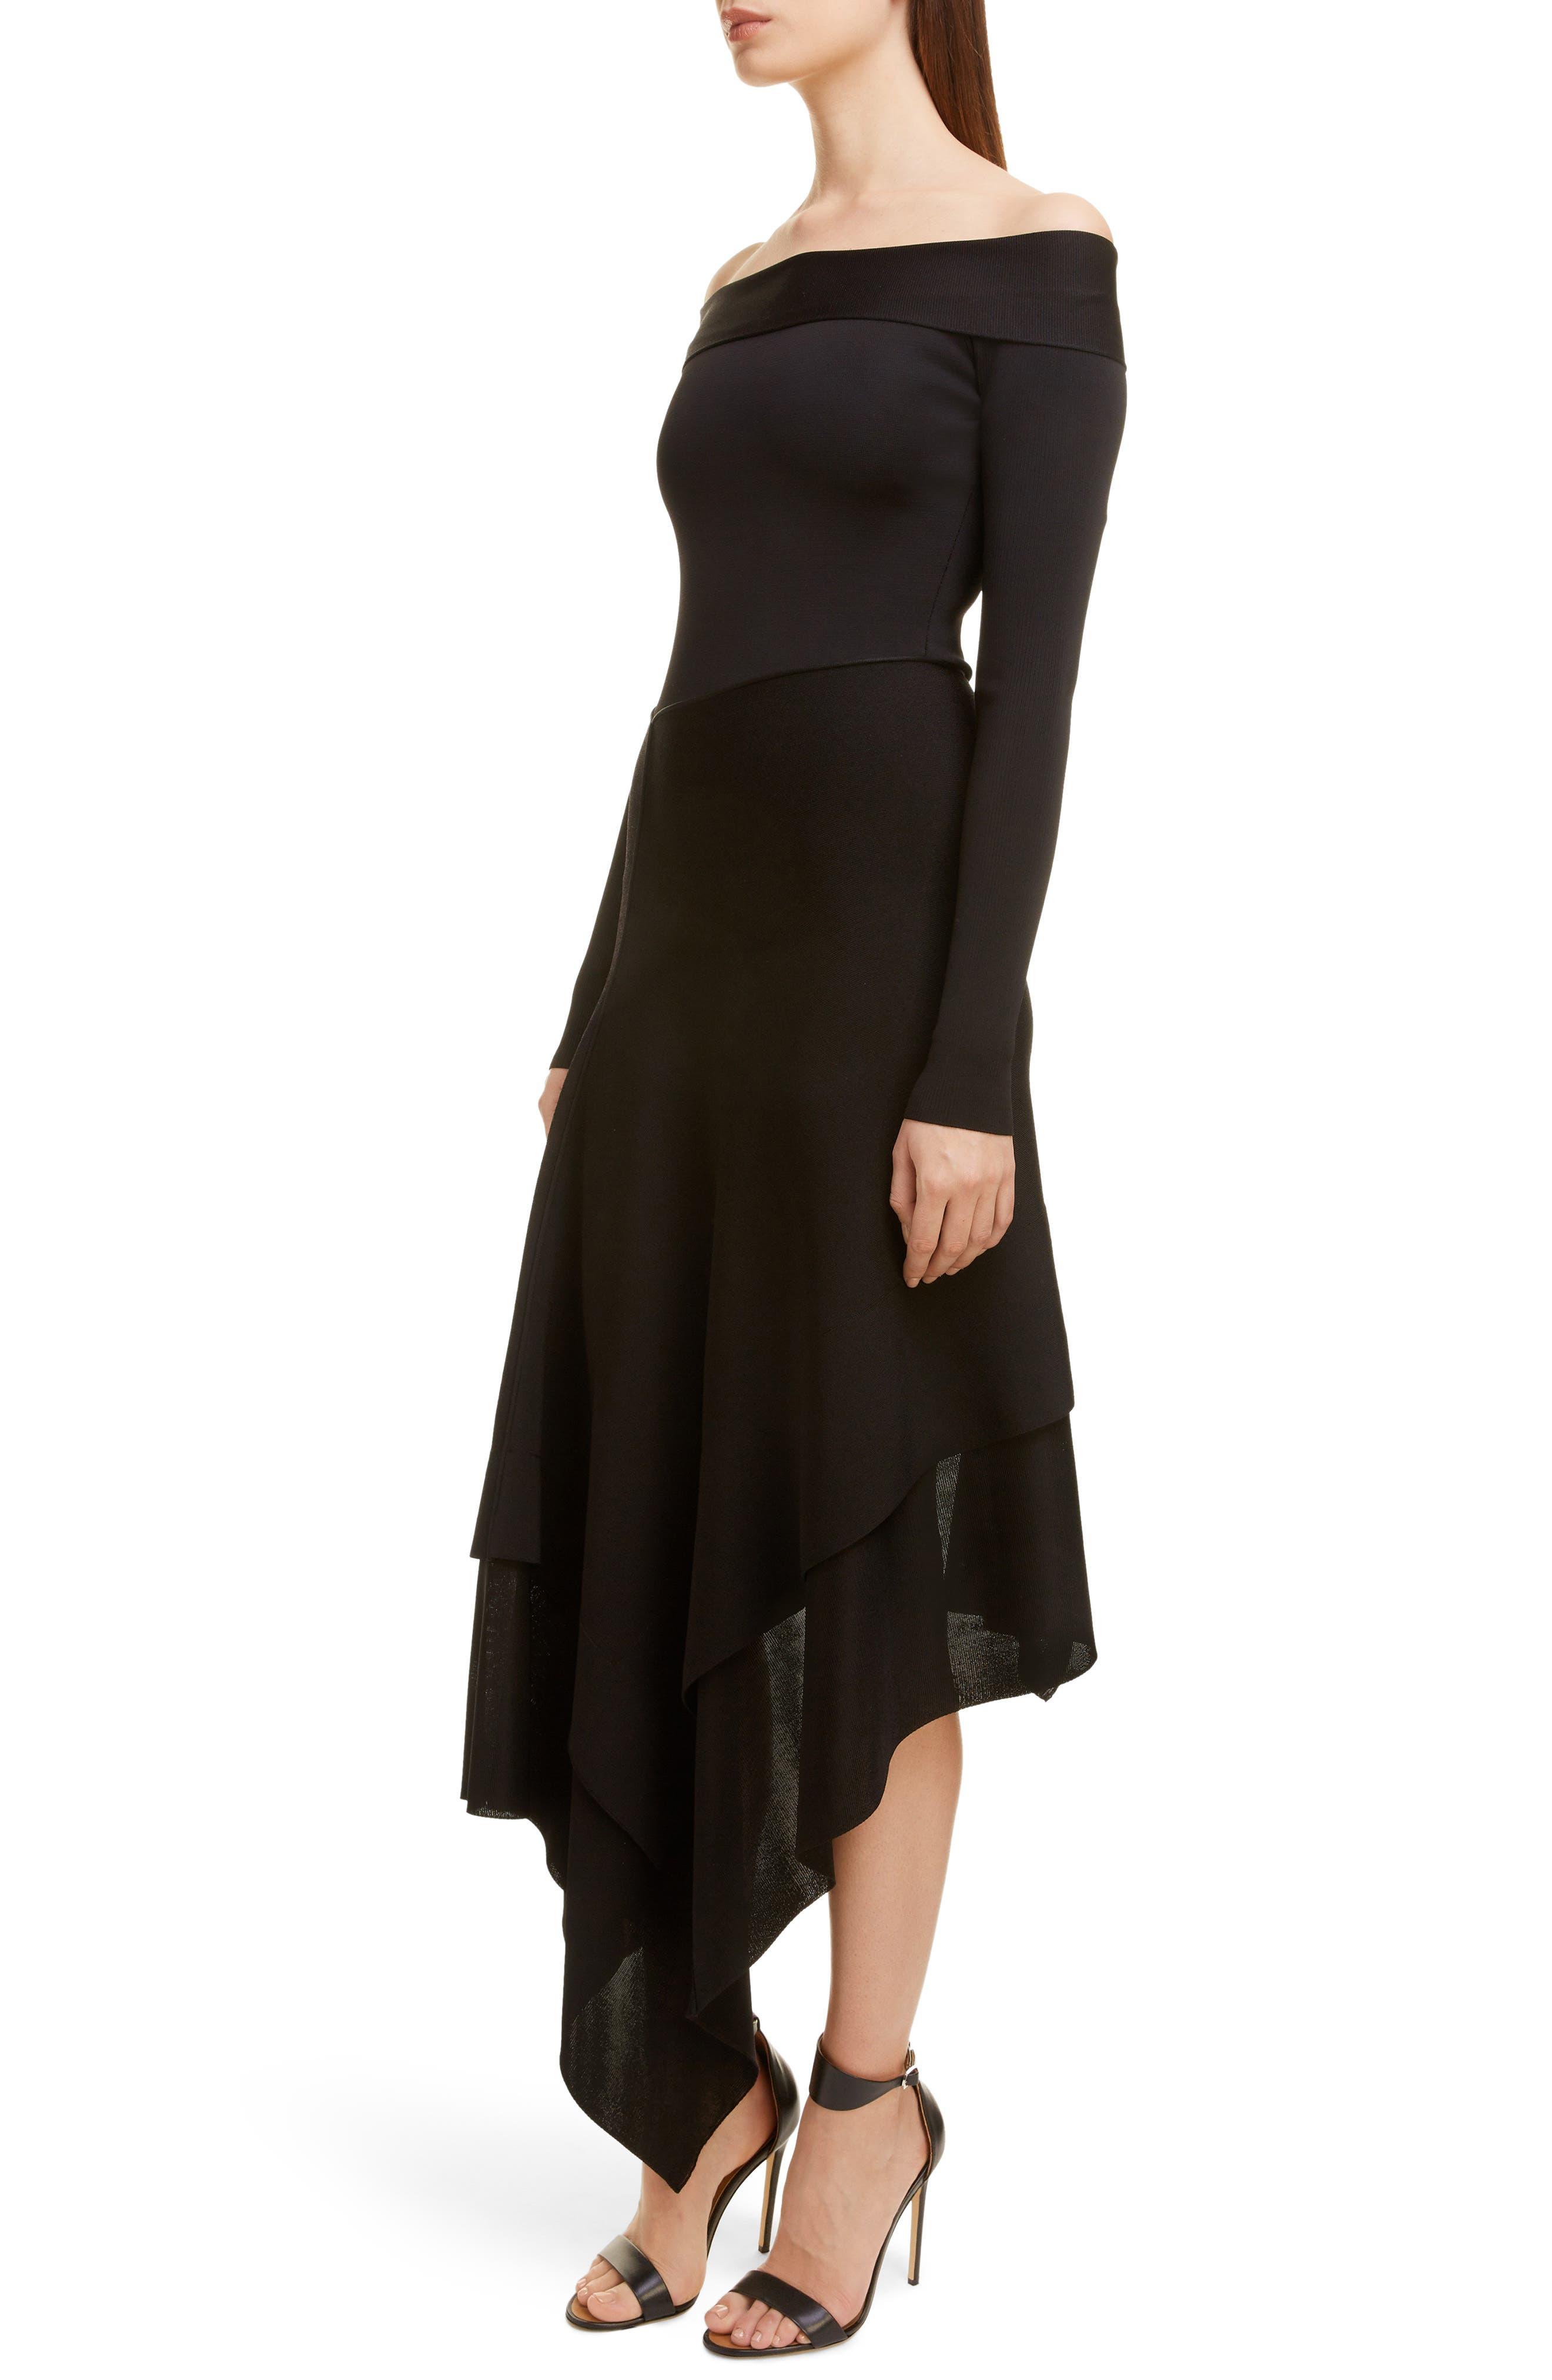 VICTORIA BECKHAM, Long Sleeve Off the Shoulder Asymmetrical Dress, Alternate thumbnail 4, color, BLACK